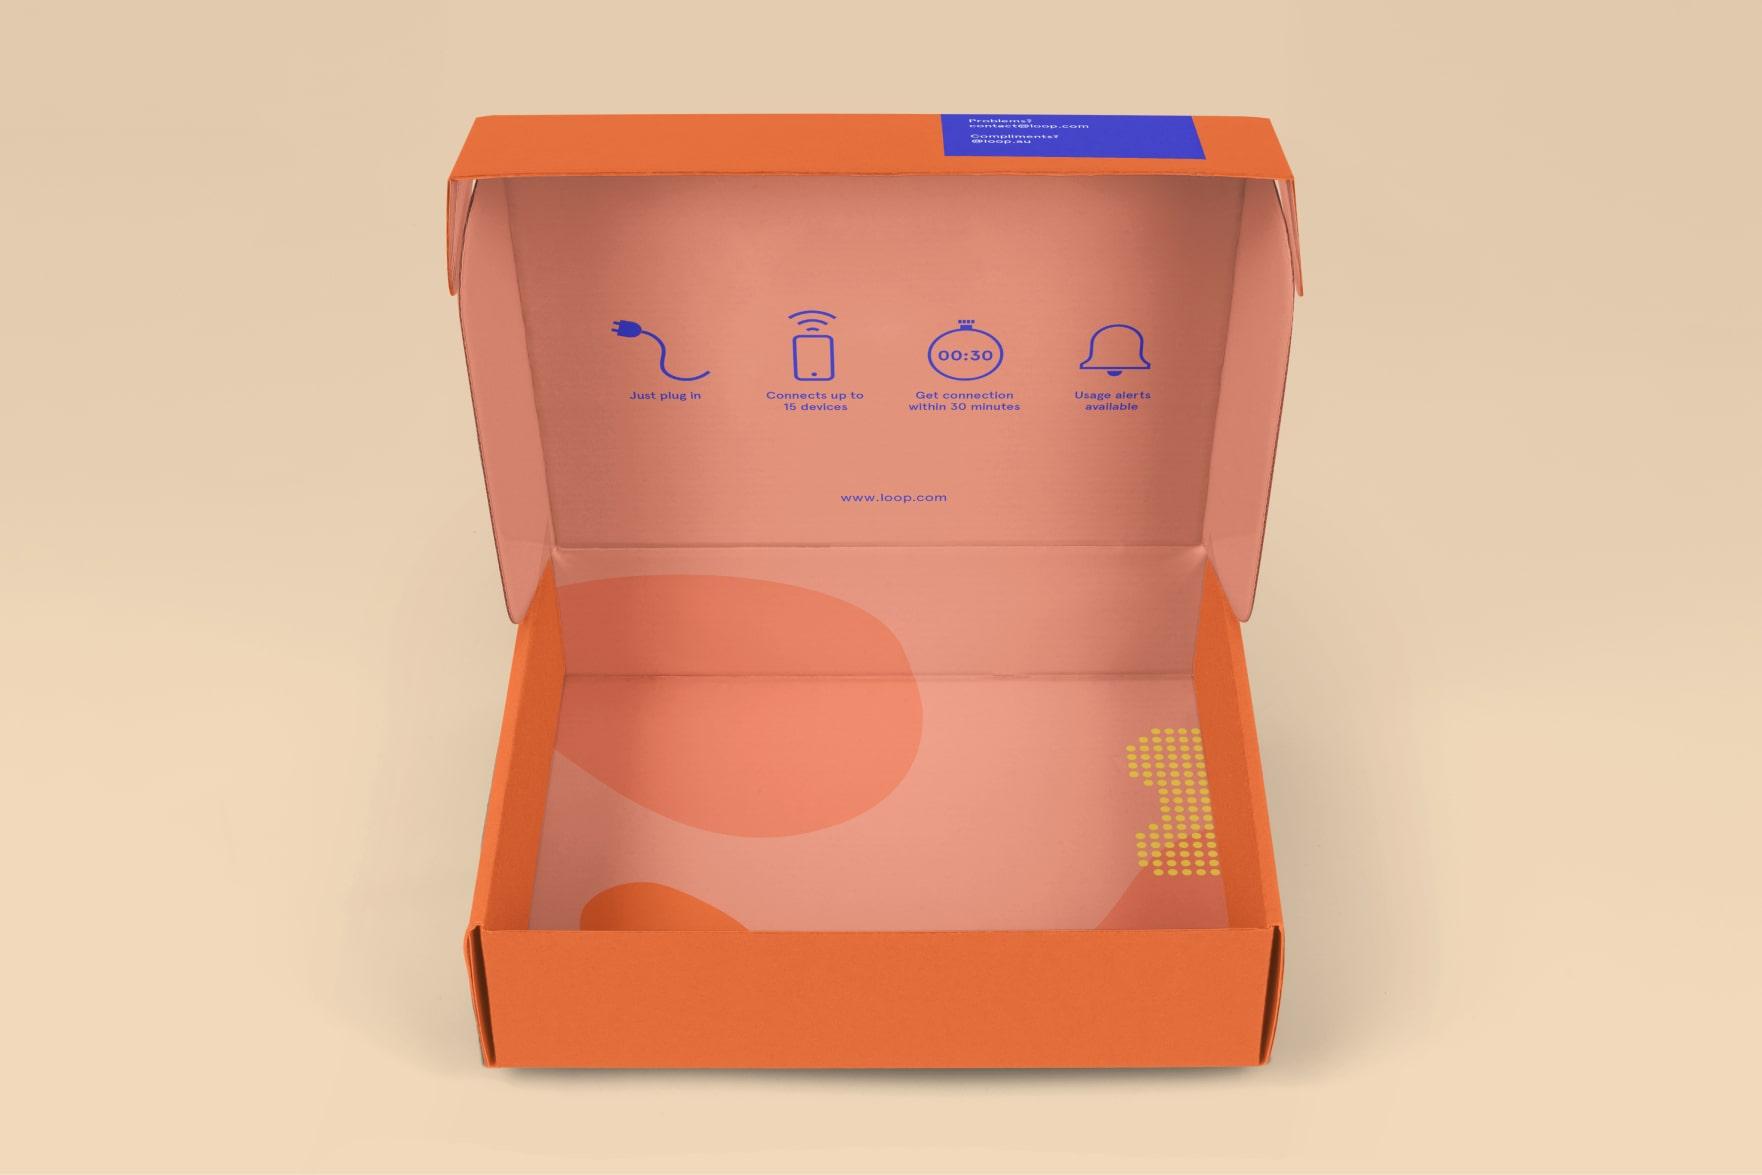 LOOP mailbox design (inside)